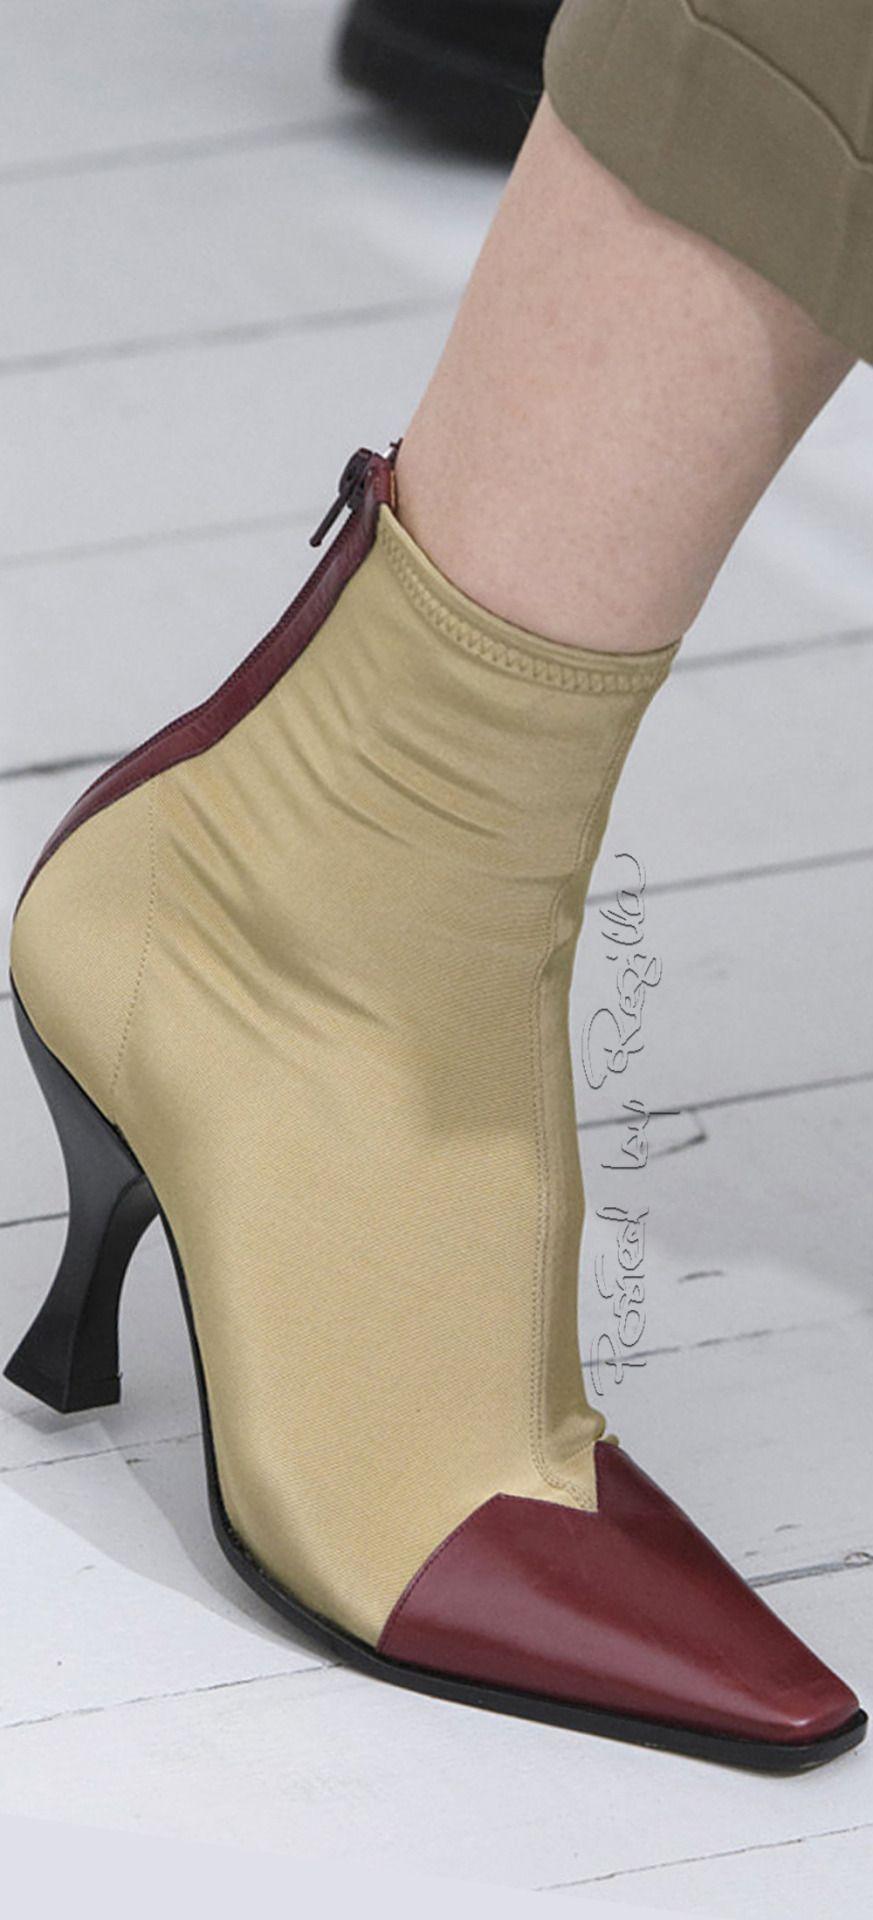 Regilla ⚜ Céline, Spring 2018 Fashion 2018 Trends, Fashion Brands, Pretty  Shoes, 4f687b05e53